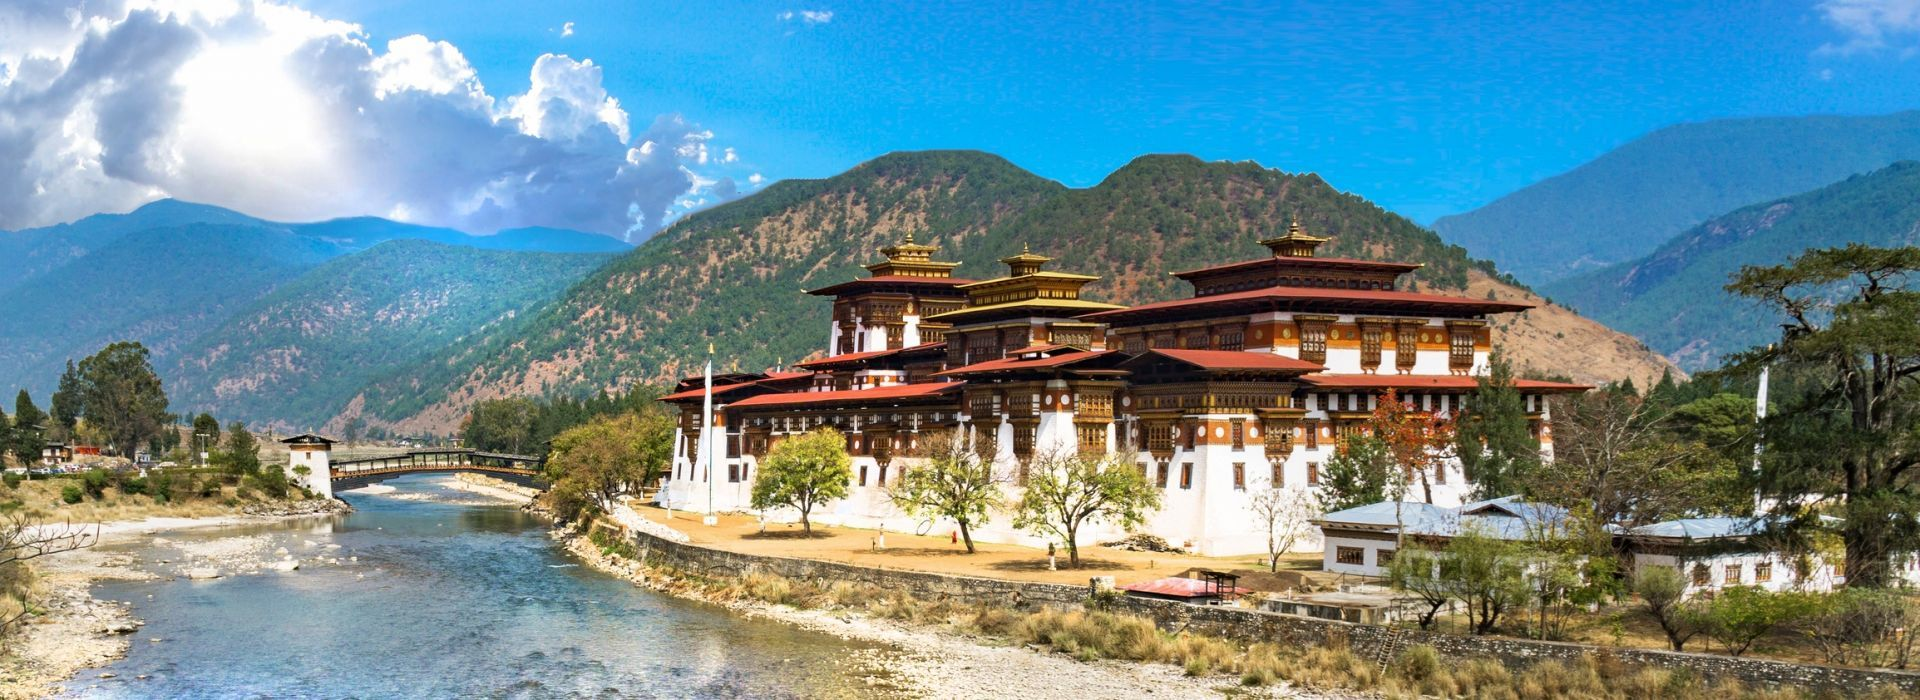 City sightseeing Tours in Bhutan